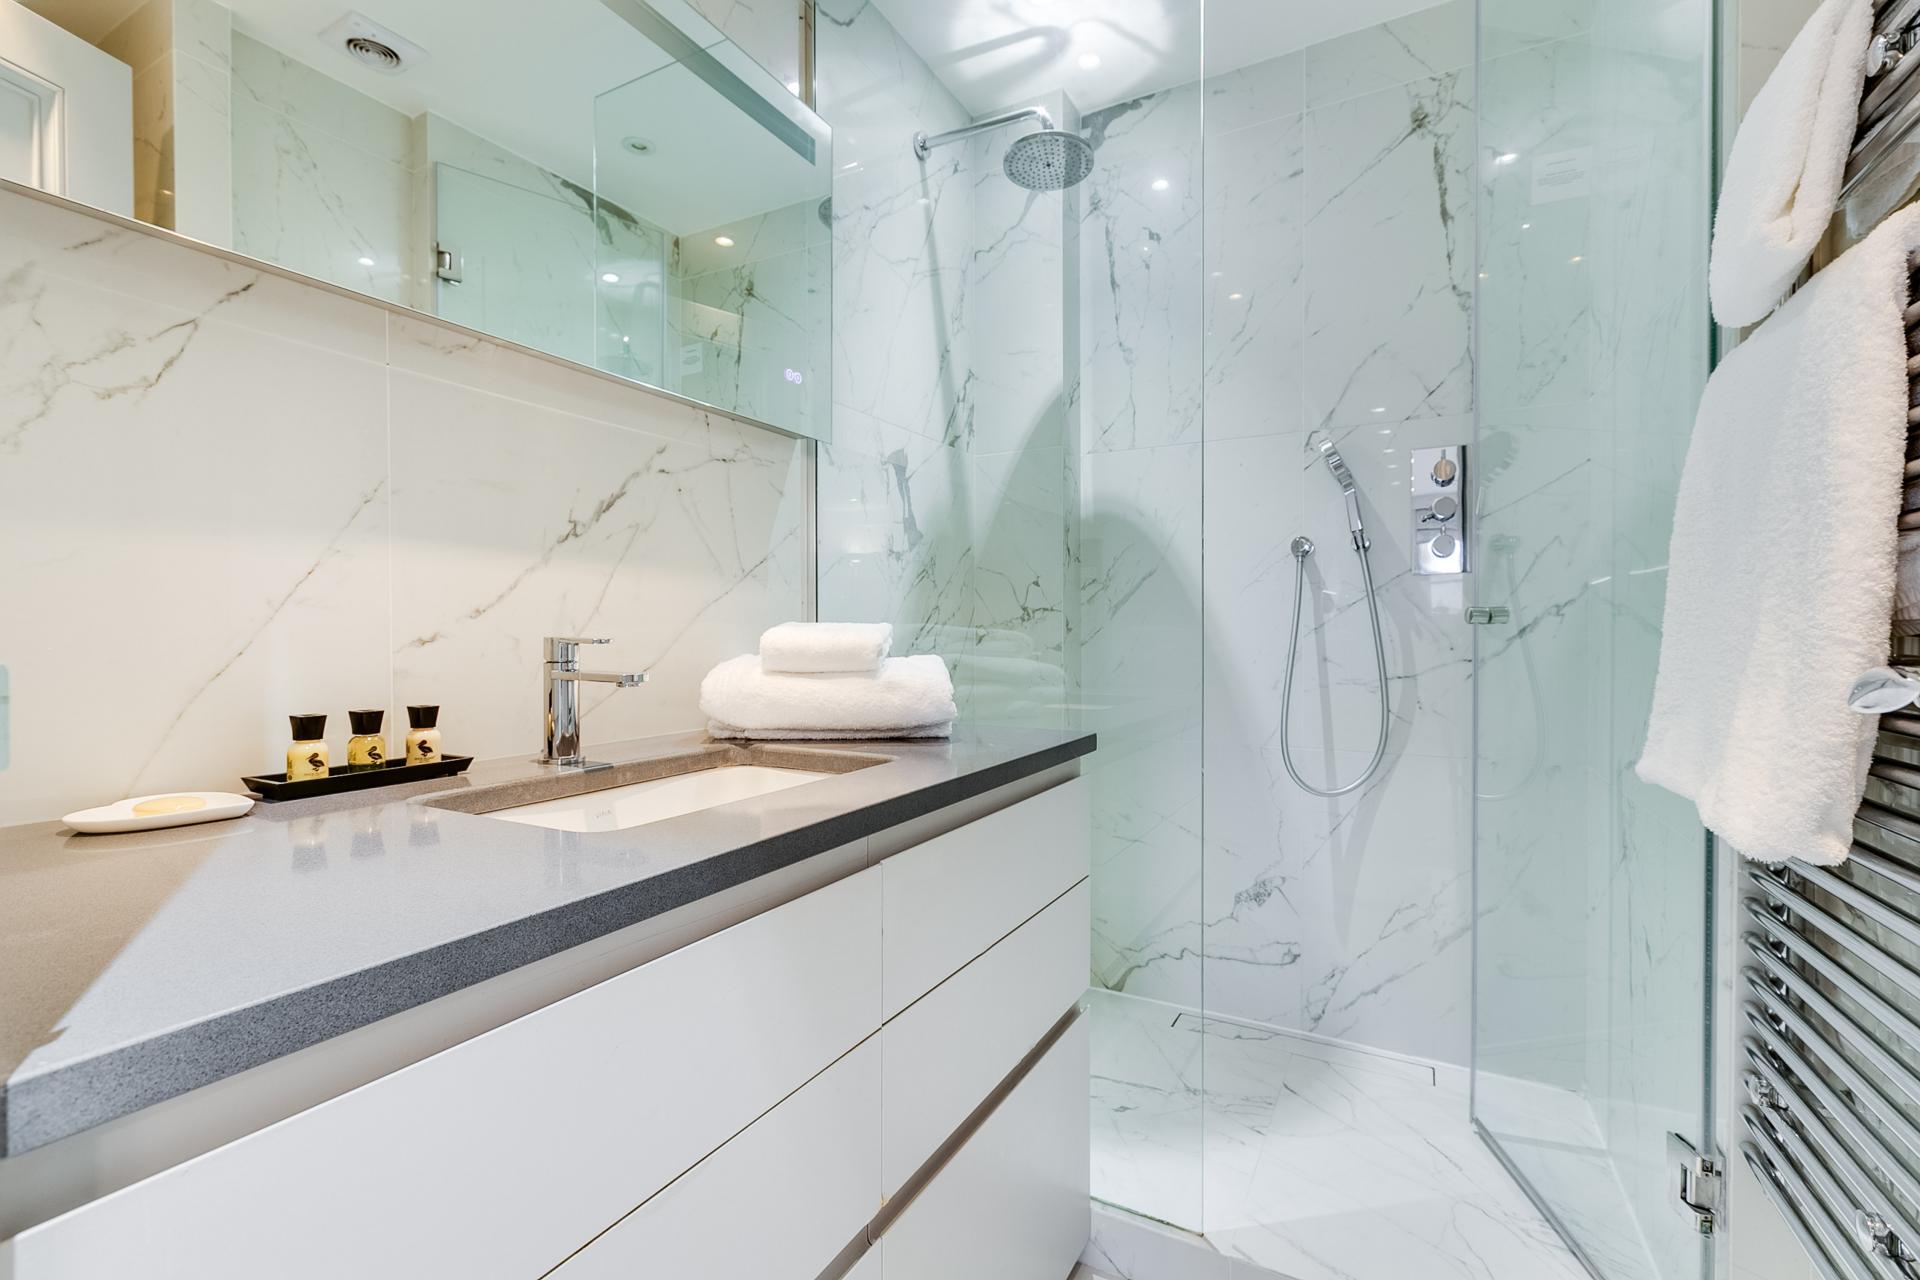 Bathroom at Nell Gwynn Chelsea Accommodation, Chelsea, London - Citybase Apartments